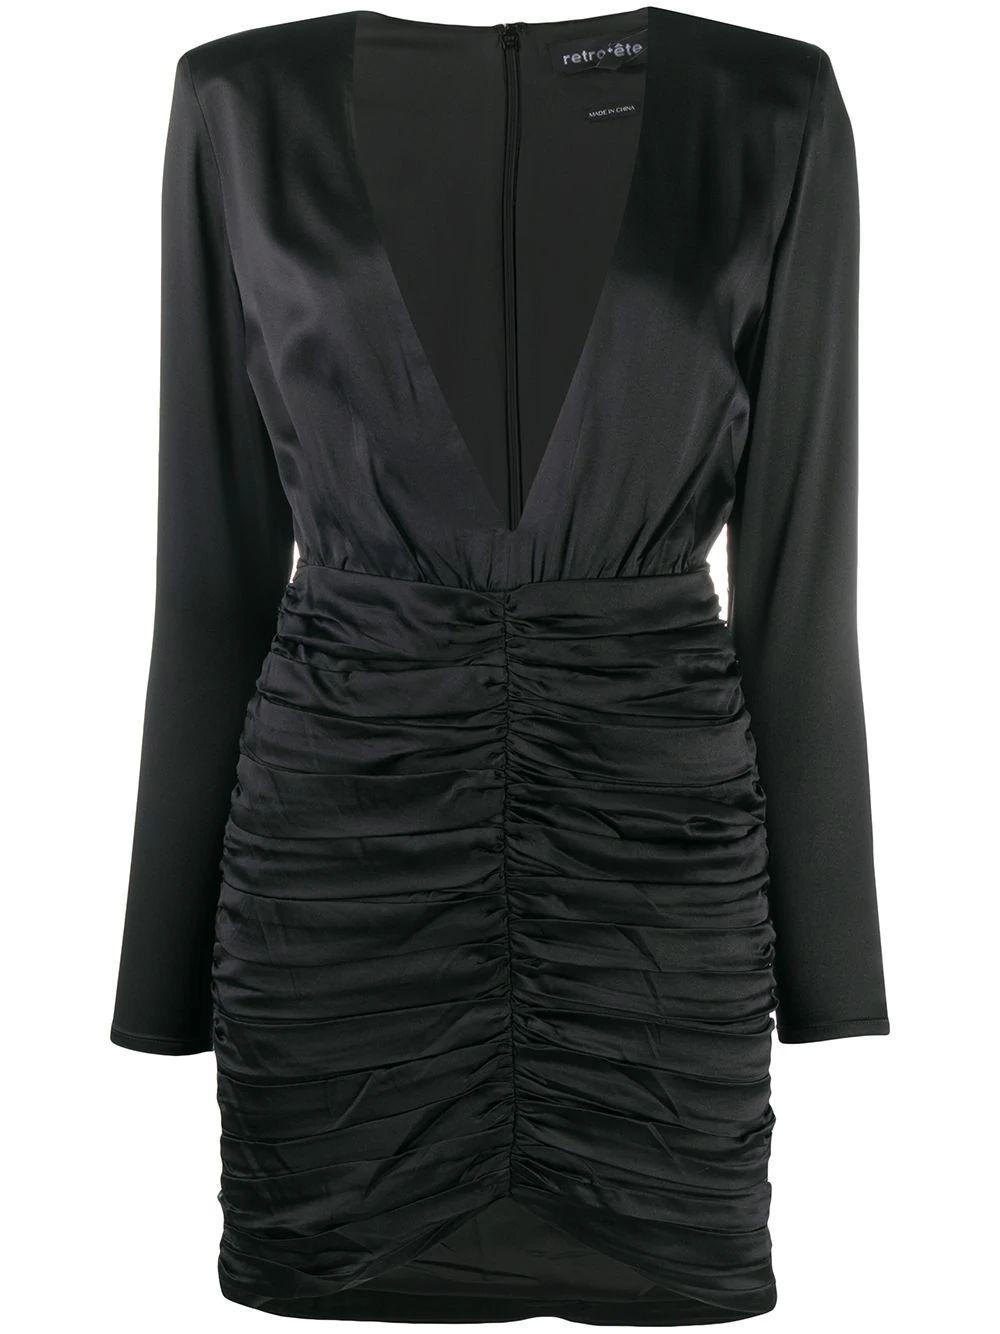 Brea Ruched Mini Dress